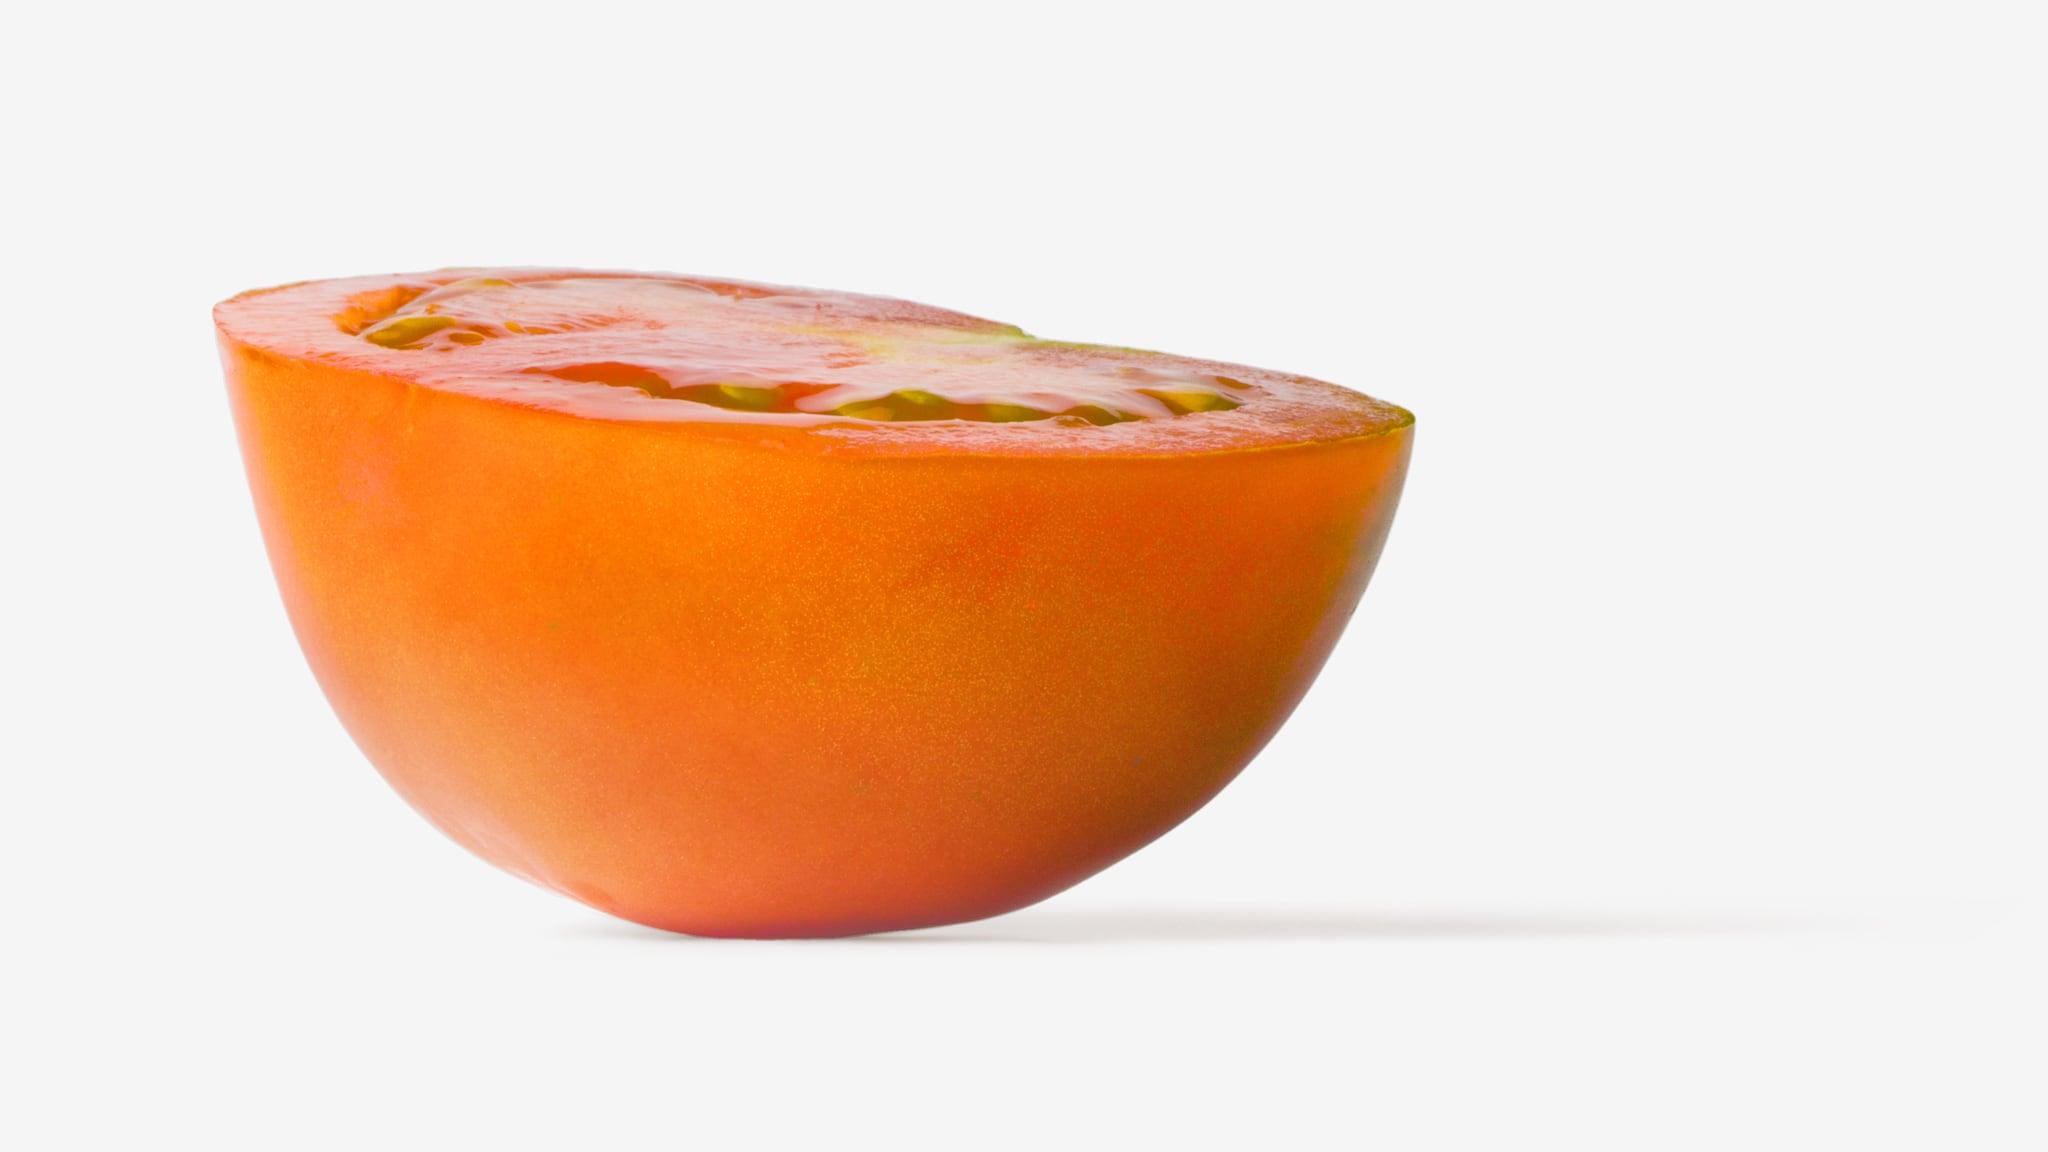 Tomato PSD layered image